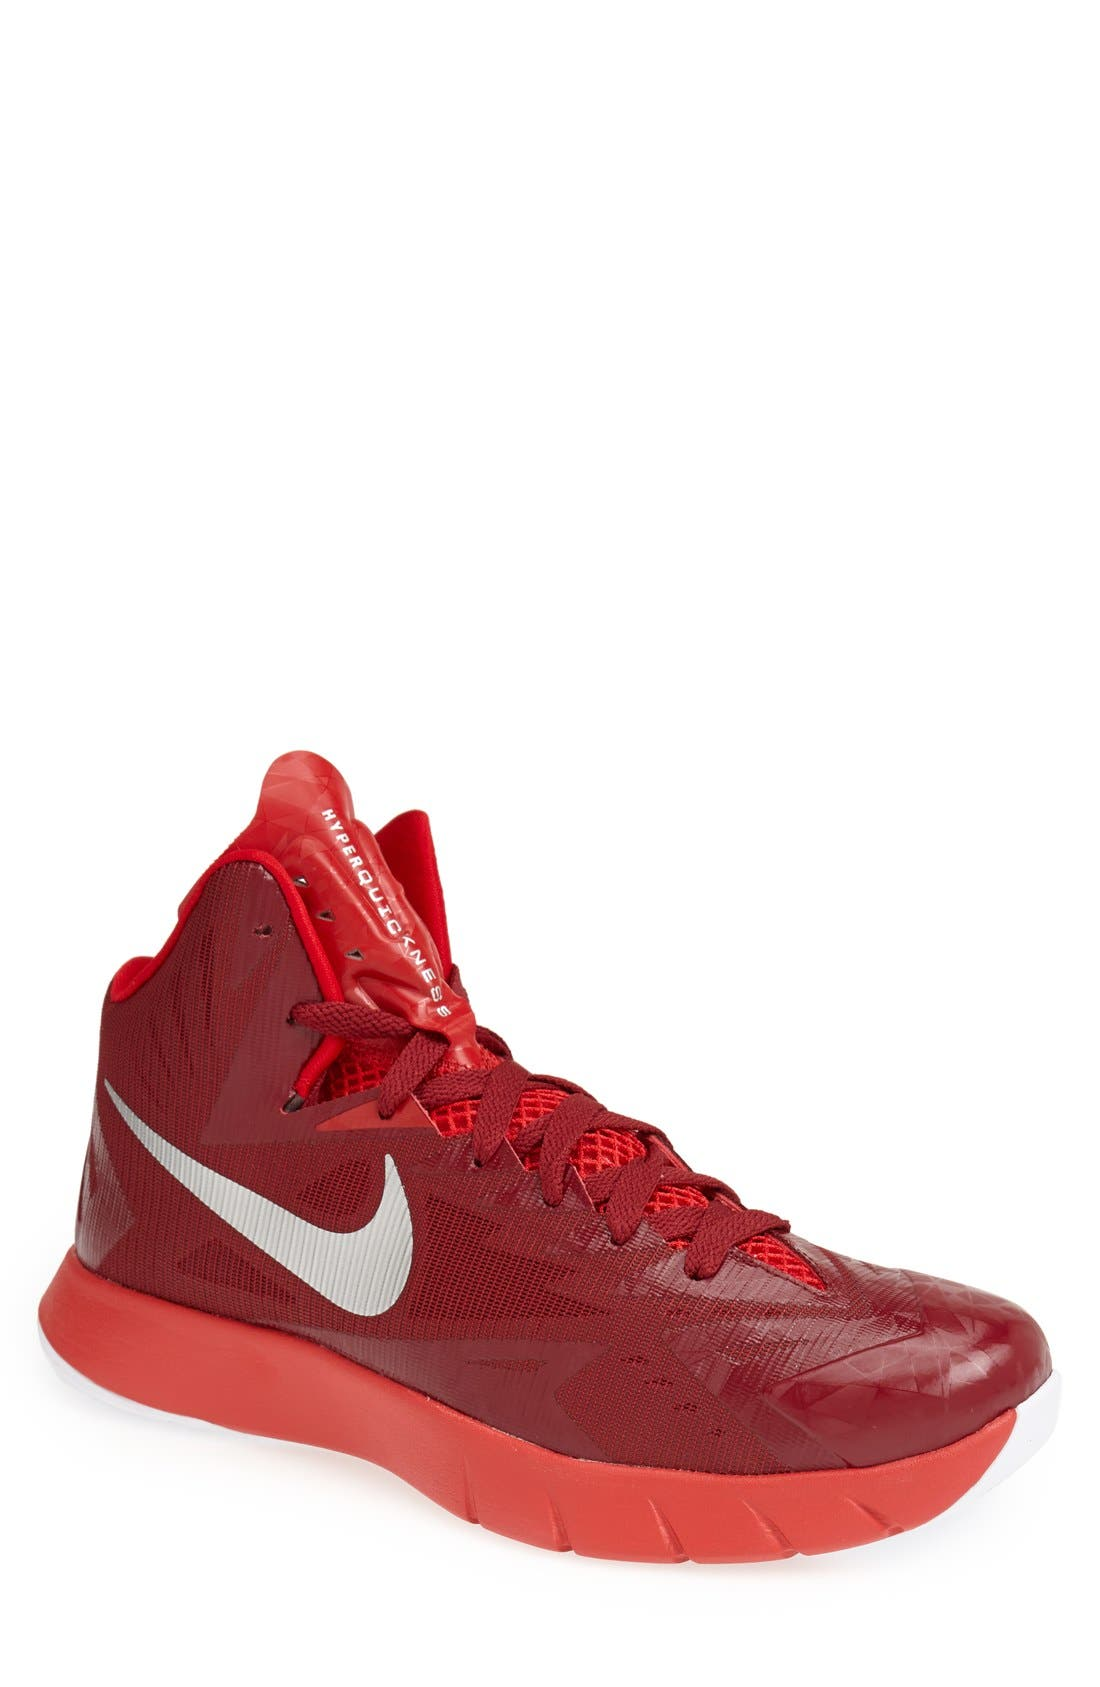 Main Image - Nike 'Lunar Hyperquickness TB' Basketball Shoe (Men)